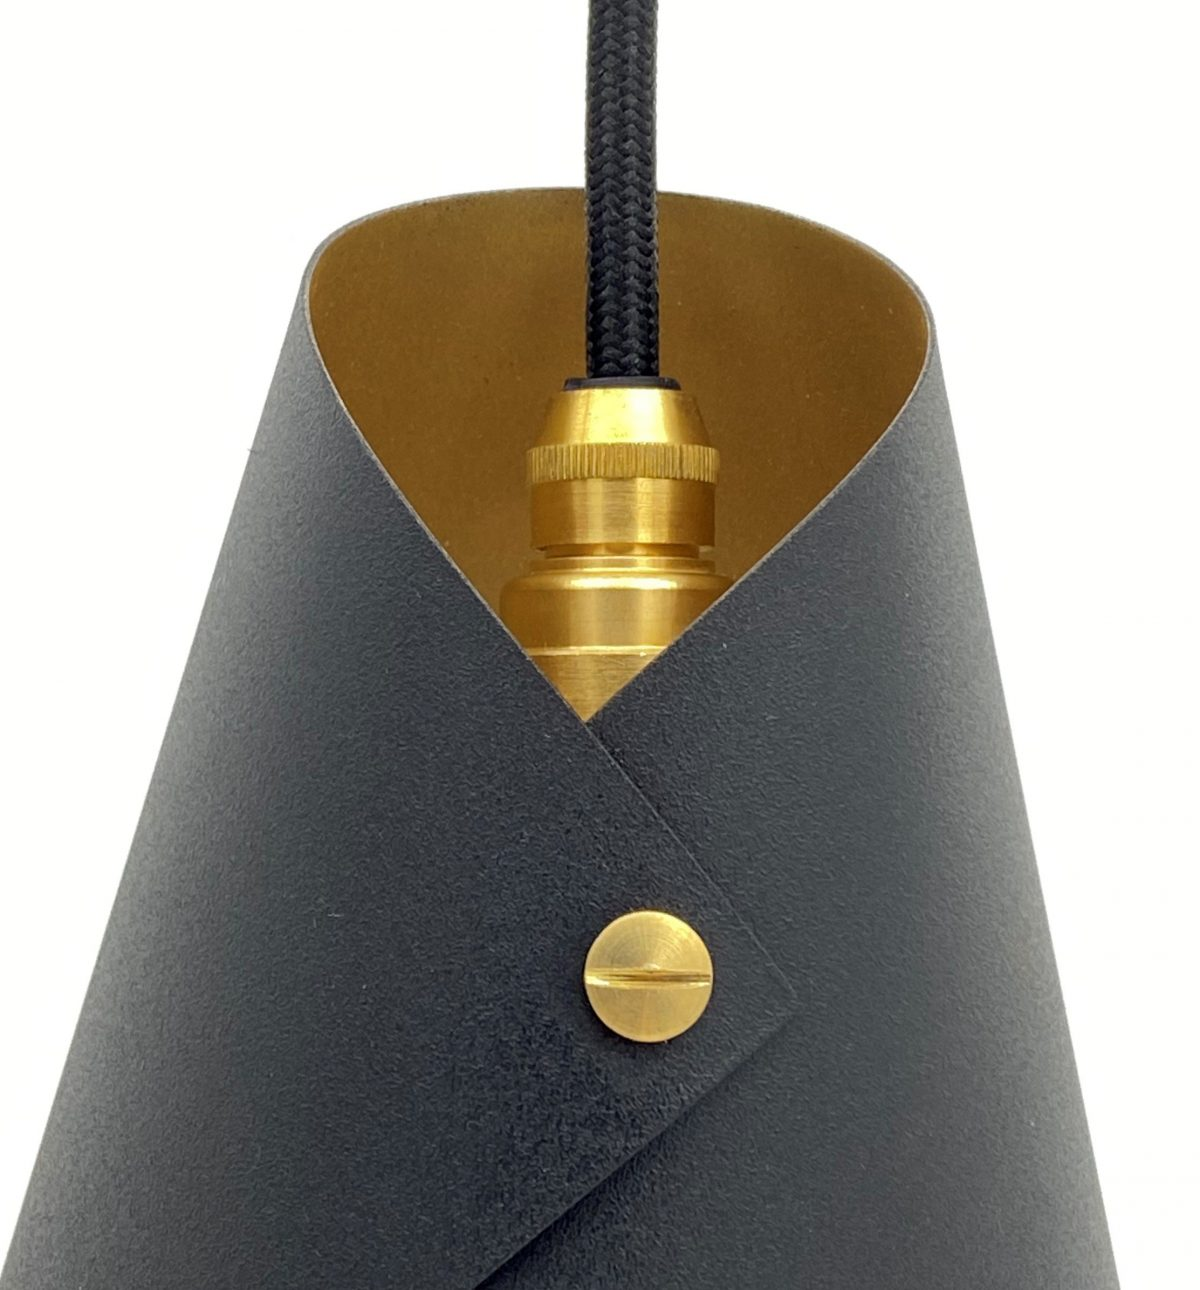 ARCFORM Single Pendant Light in Copper & Matte Black